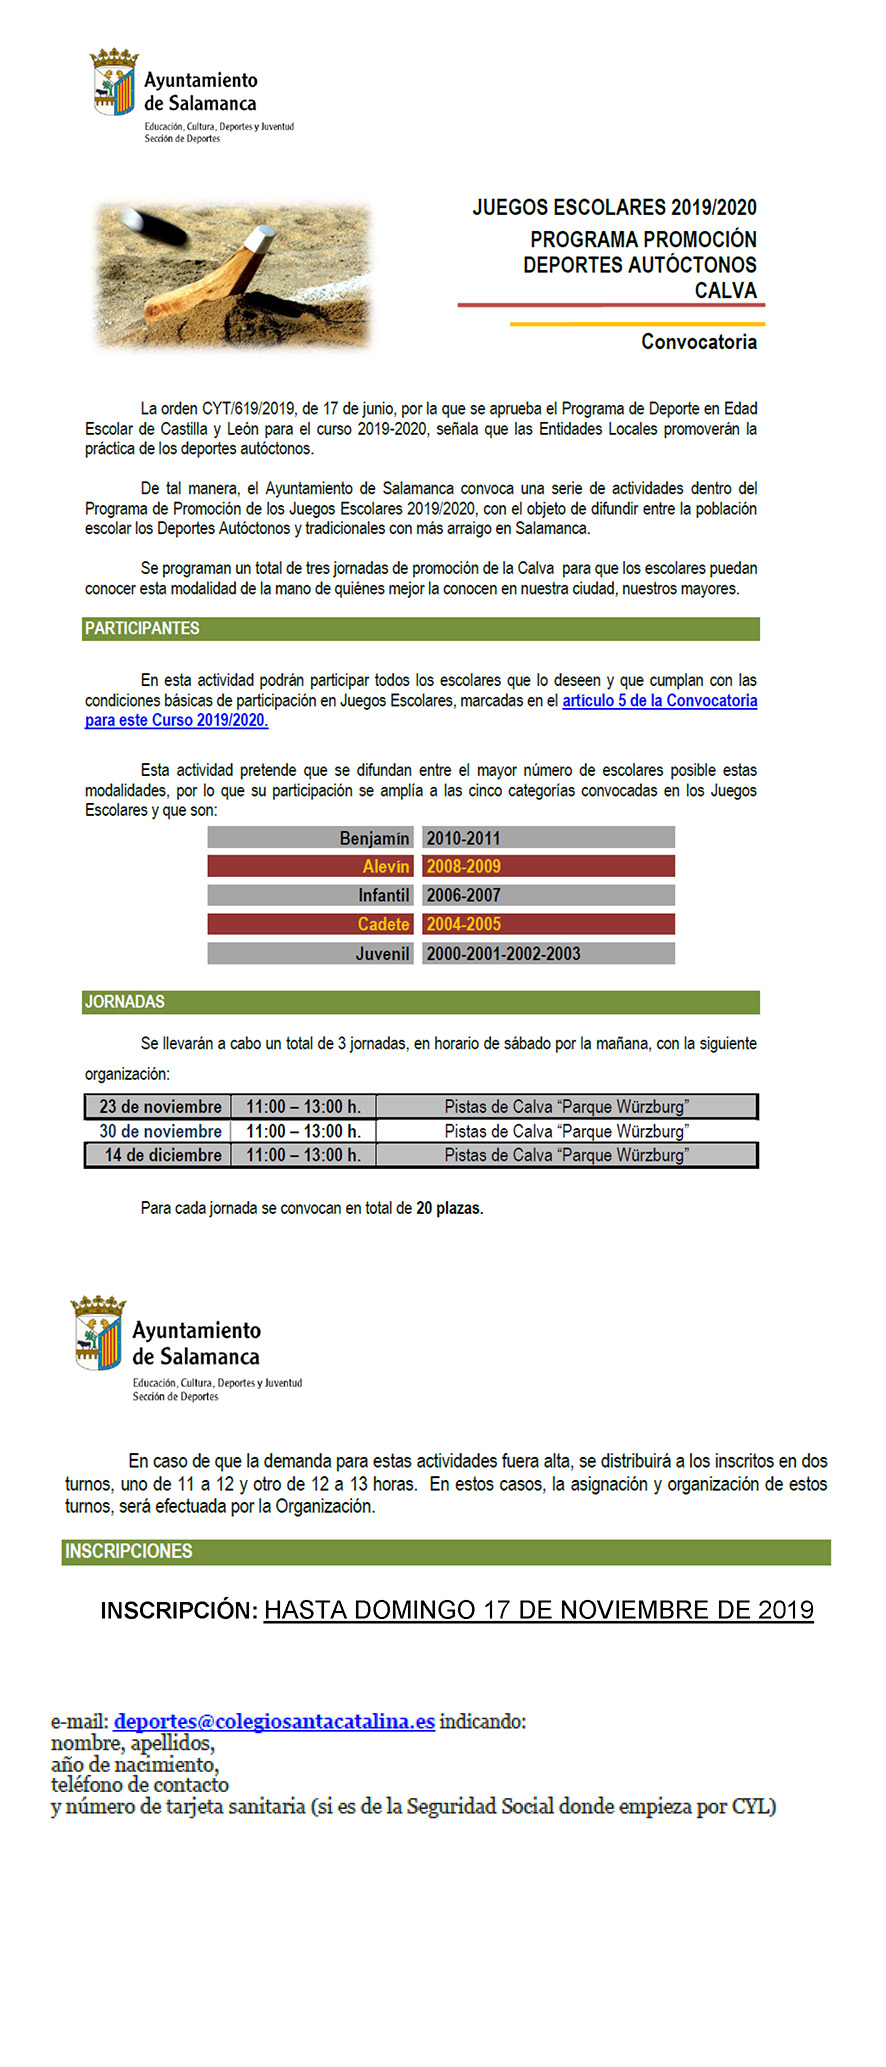 CONVOCATORIA CALVA 2019 (2000-2011)_Página_1